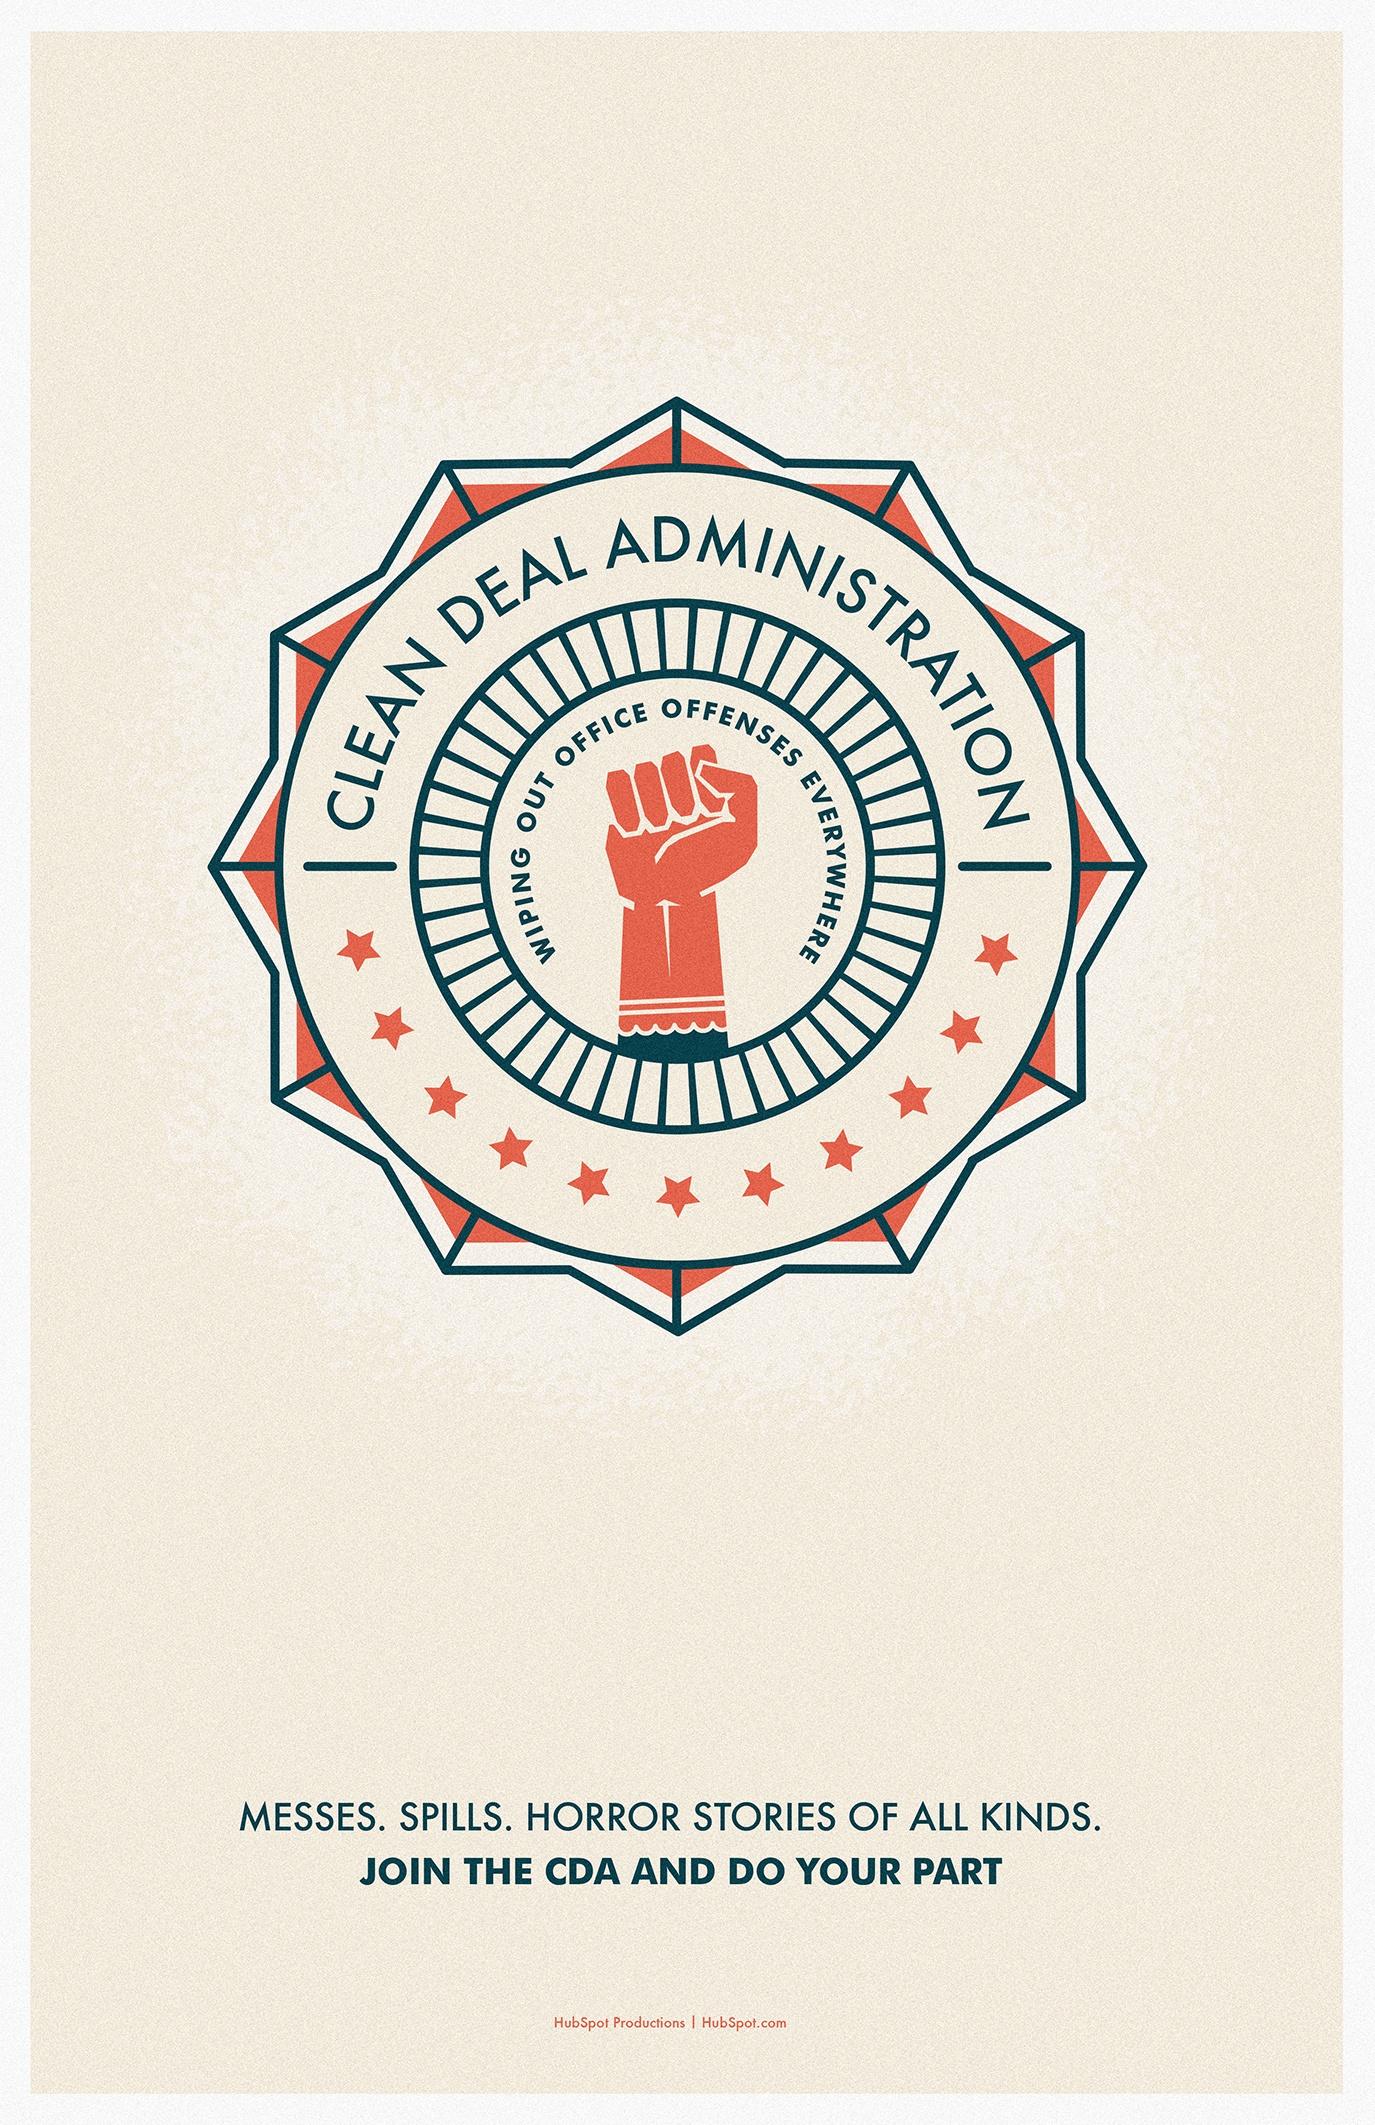 CDA_badge.jpg